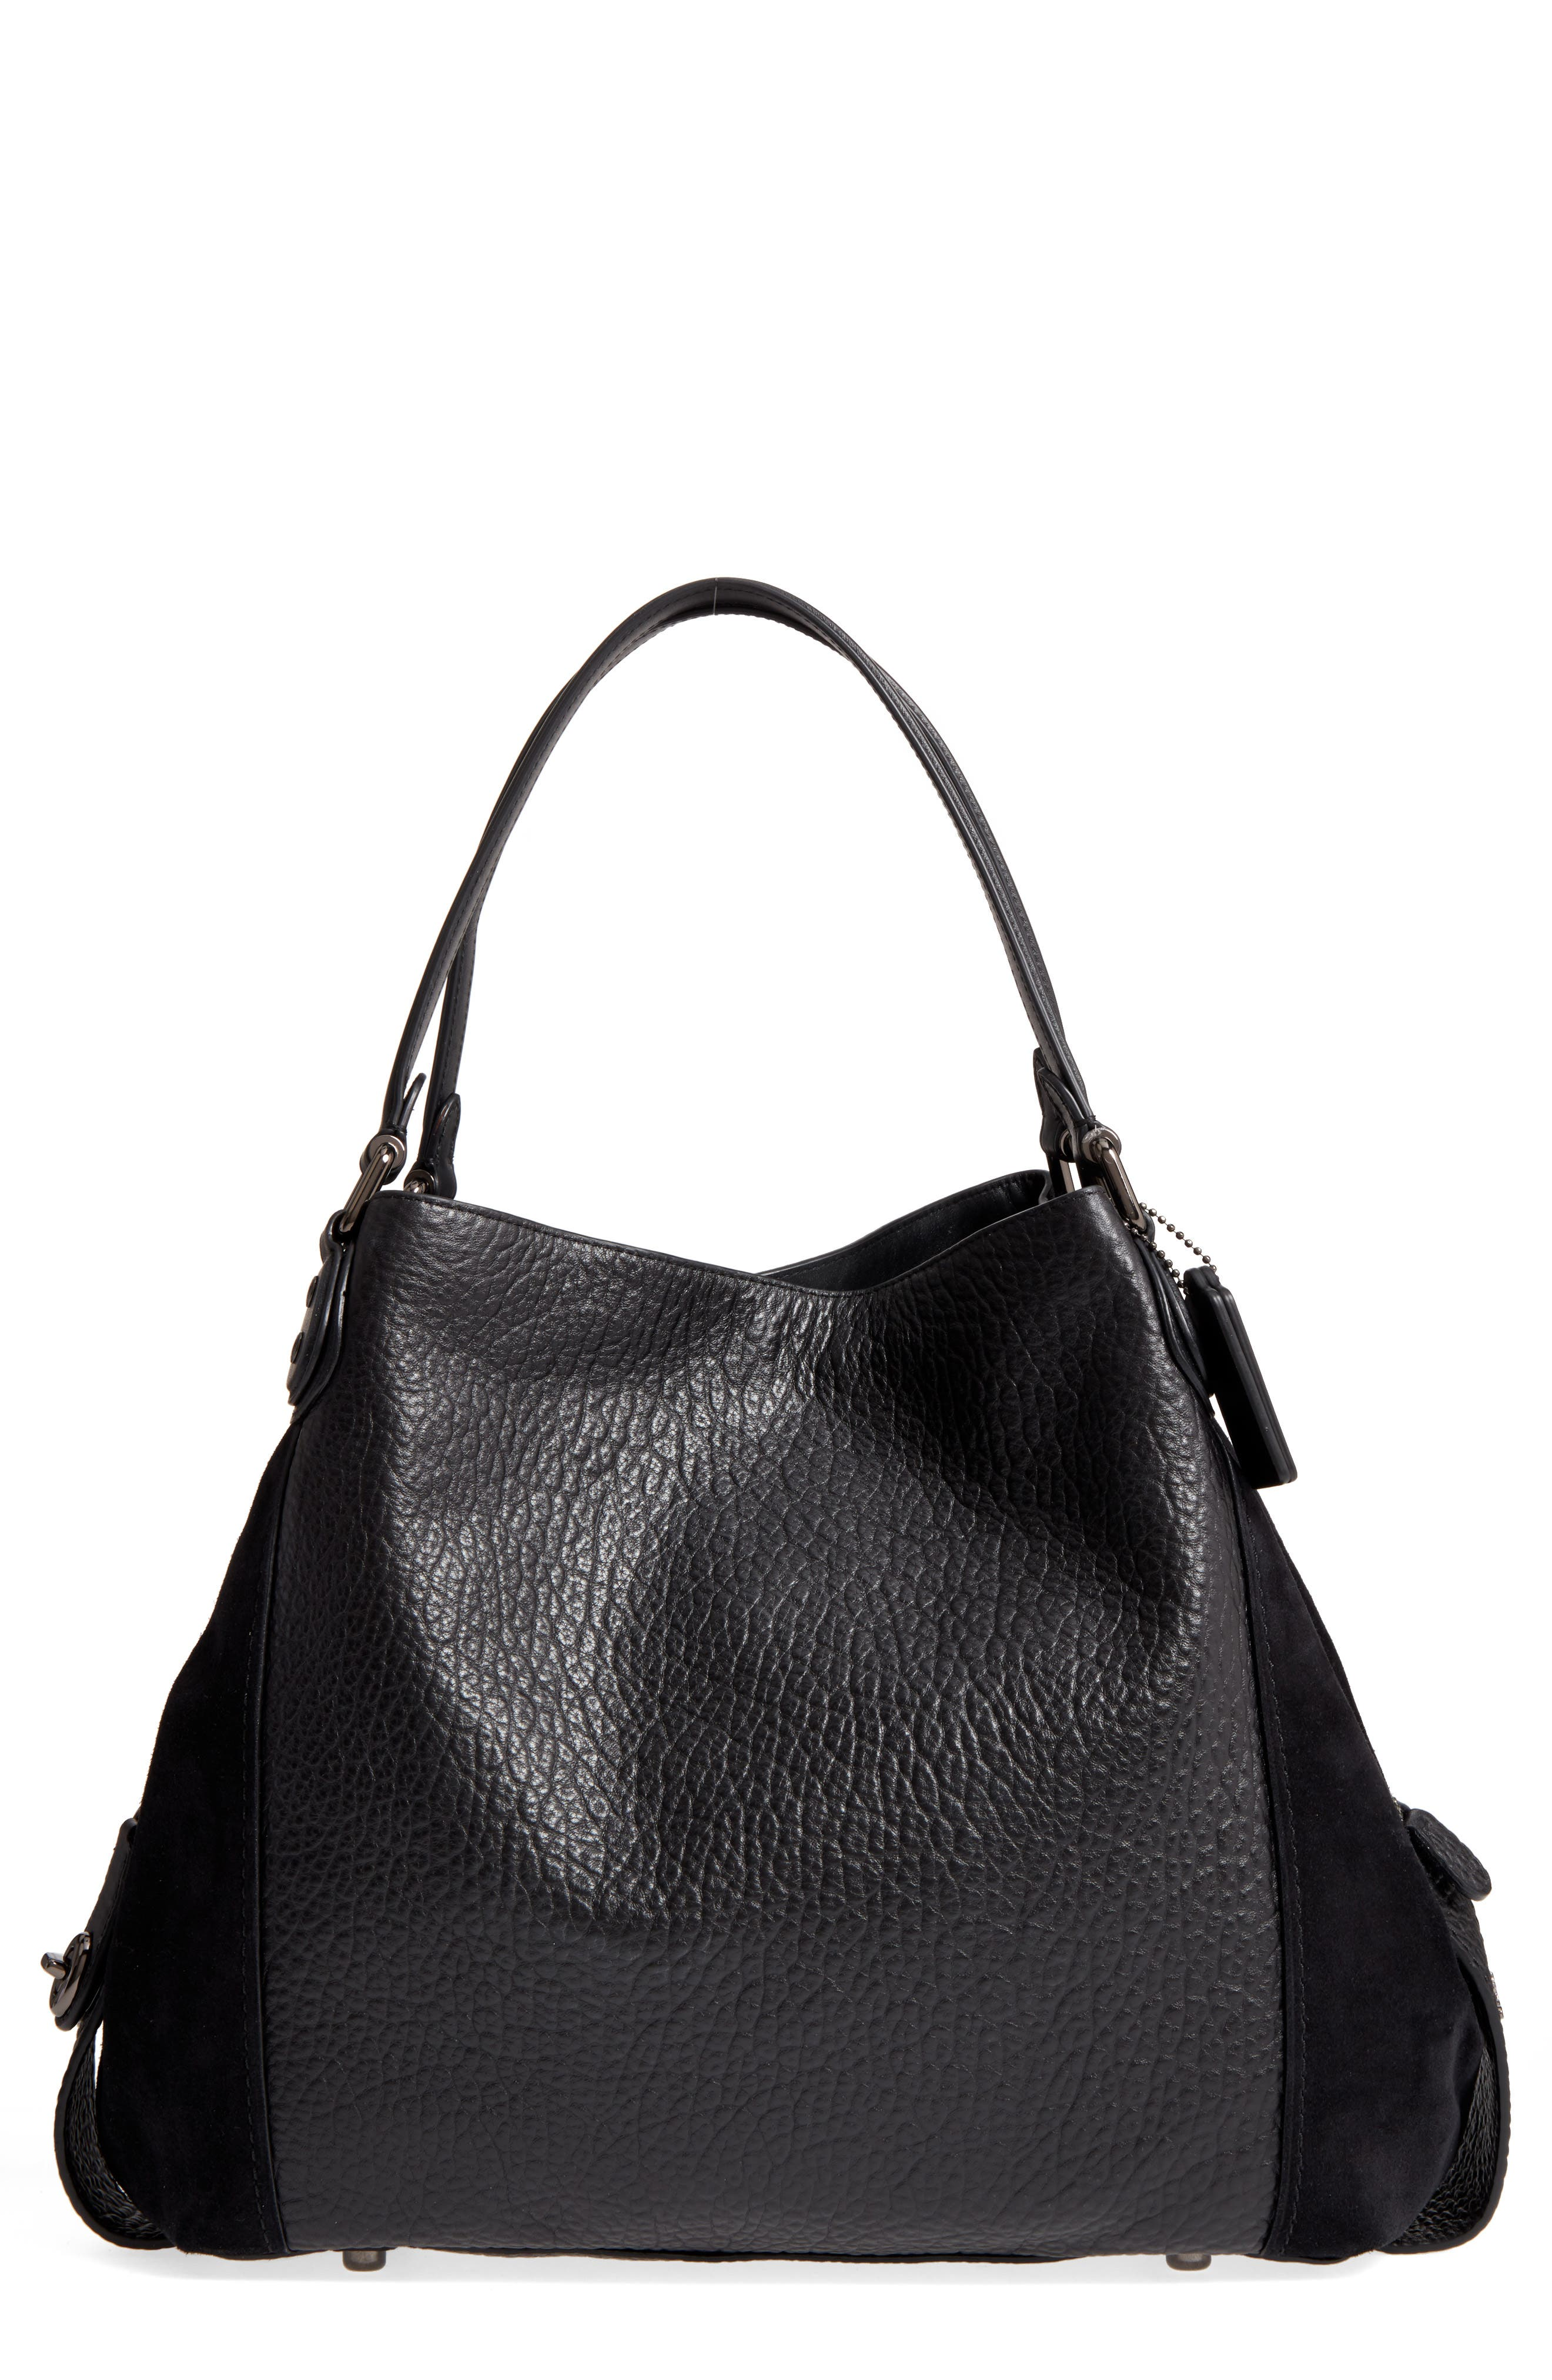 COACH Edie 42 Leather & Suede Shoulder Bag